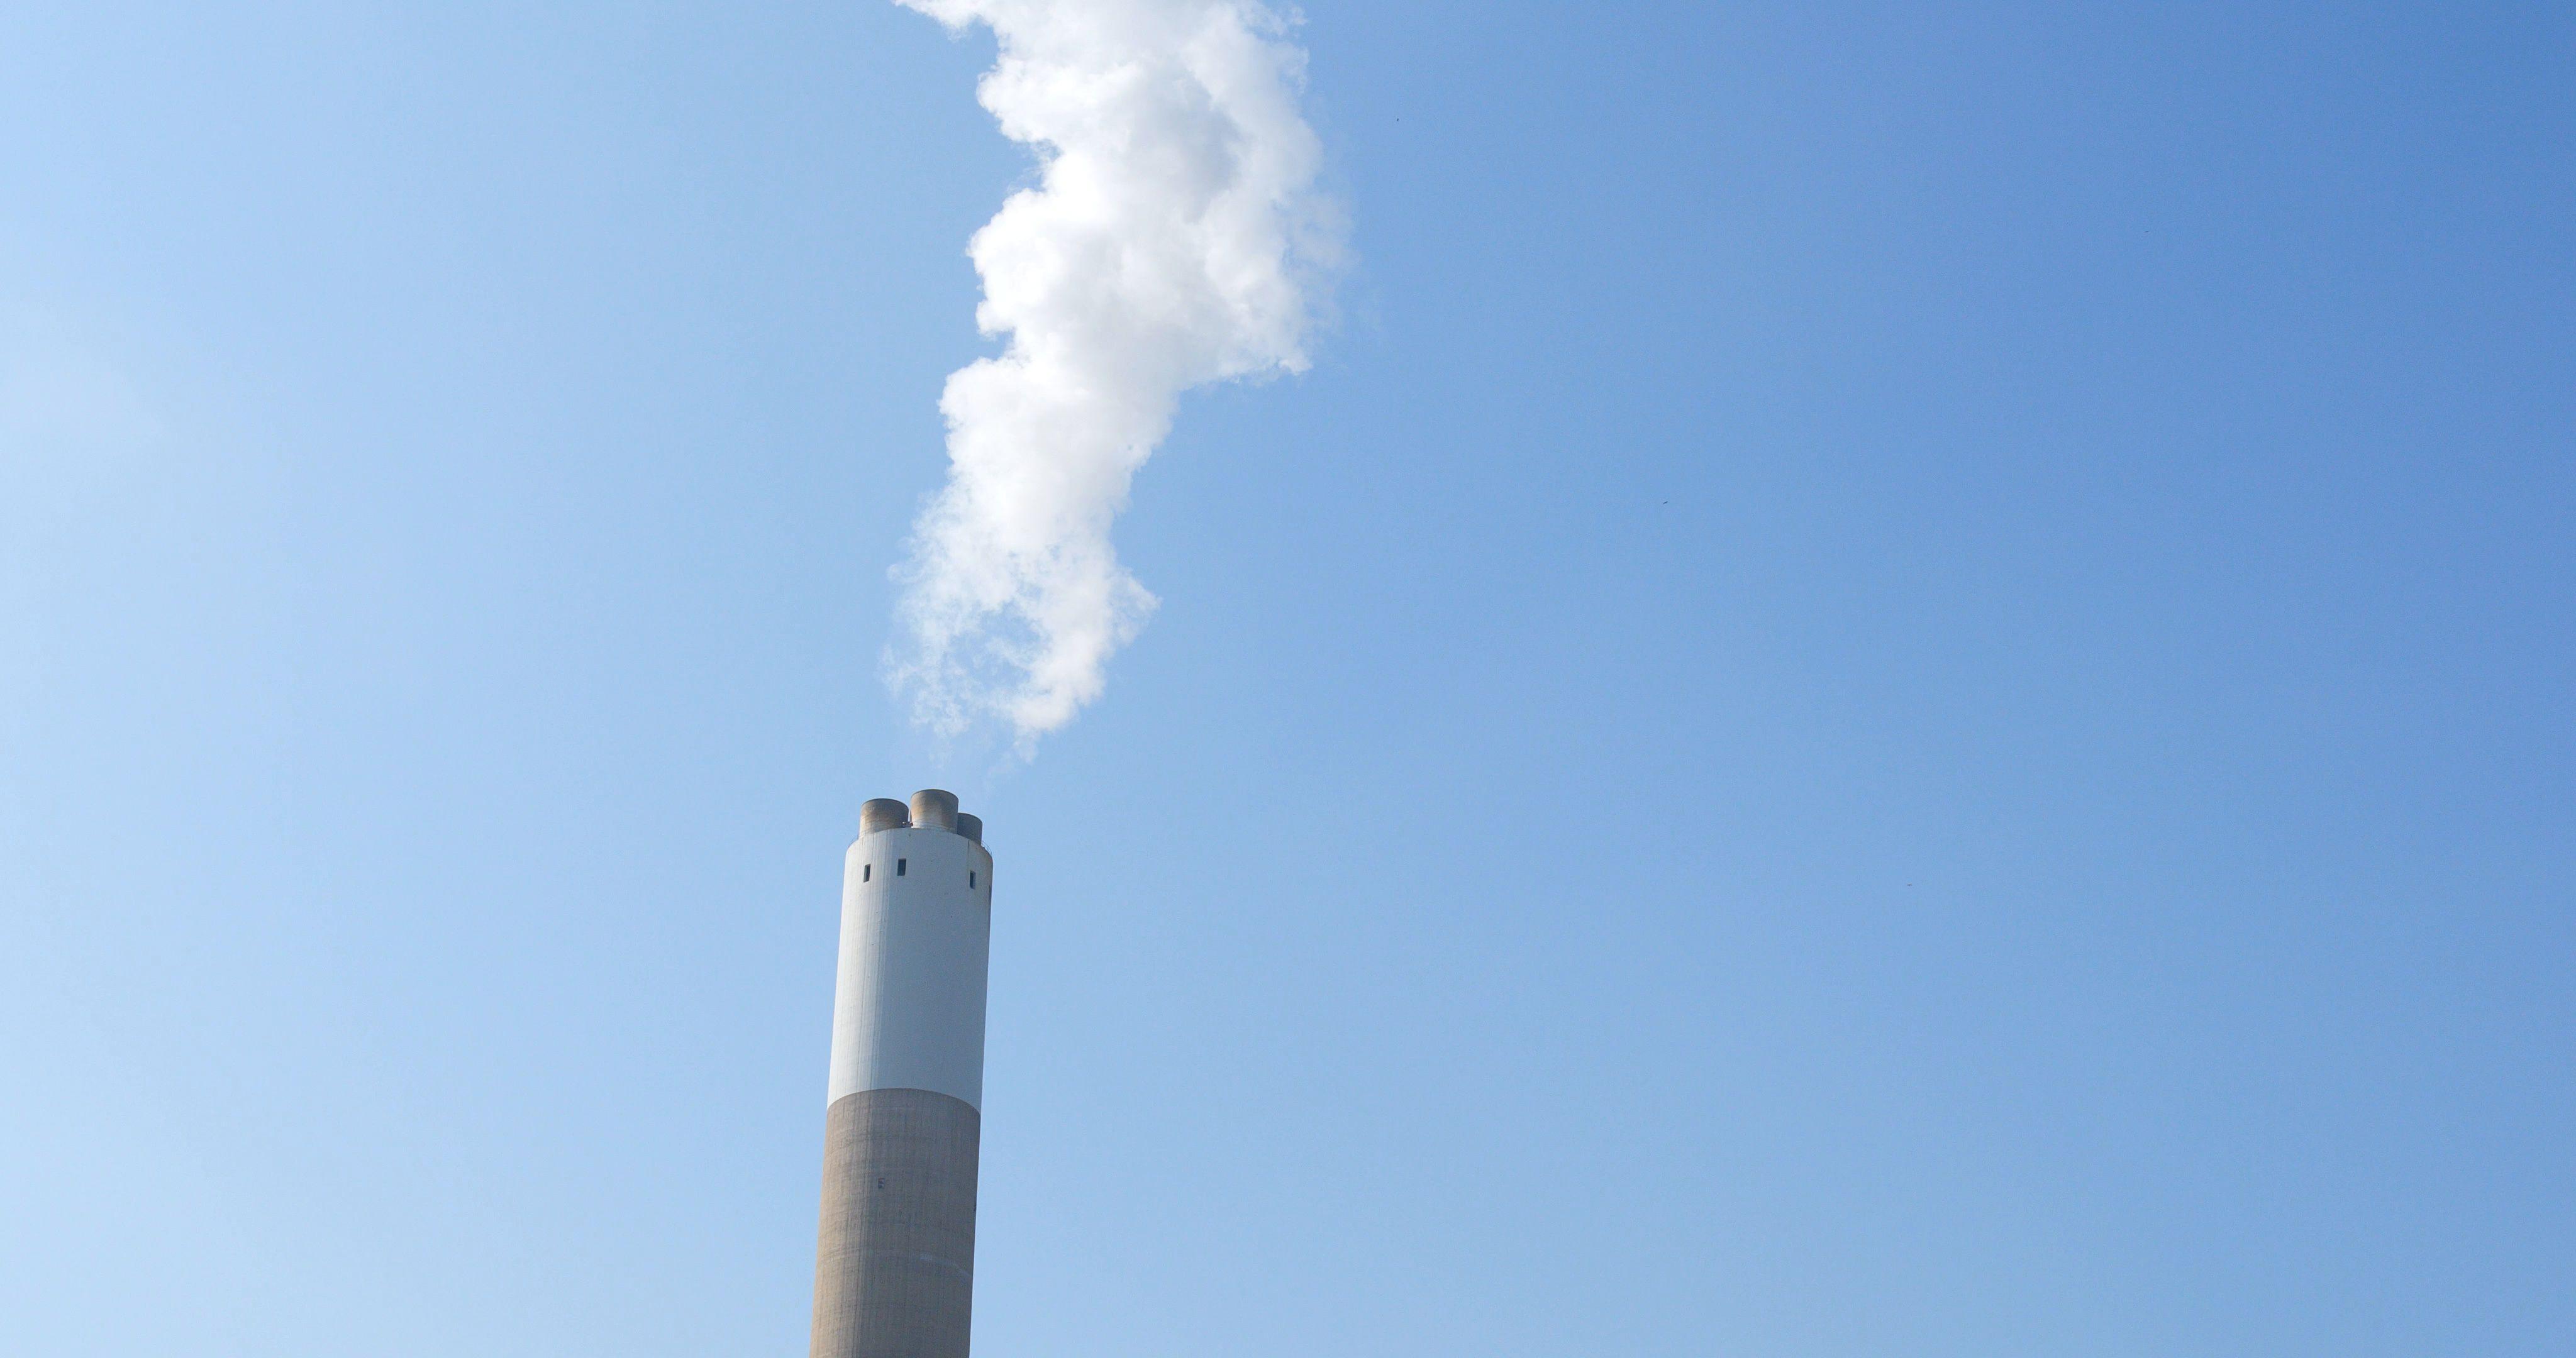 Chimney Smoke And Blue Sky Stock Footage Blue Smoke Chimney